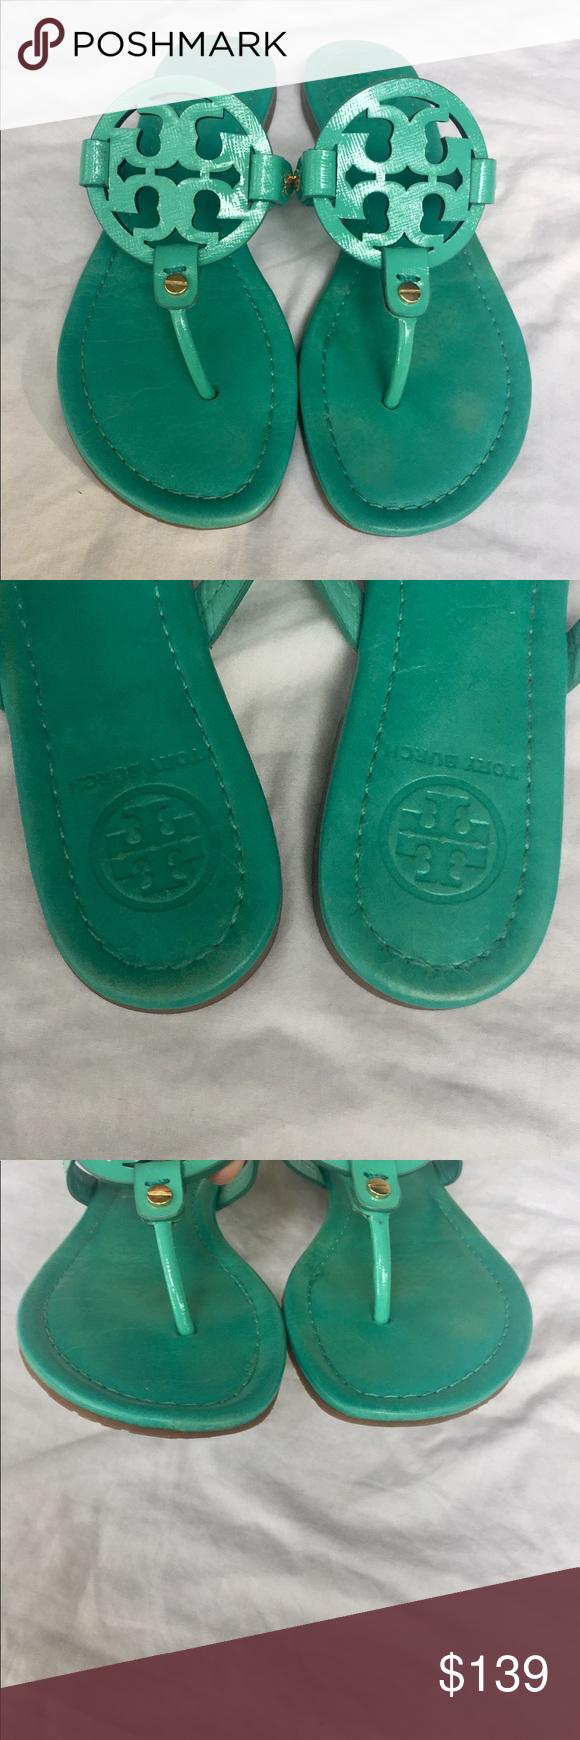 88ae609fa07f Tory Burch Island Turquoise Miller Sandals Tory Burch Miller Sandals. Tory  Burch Color  Island